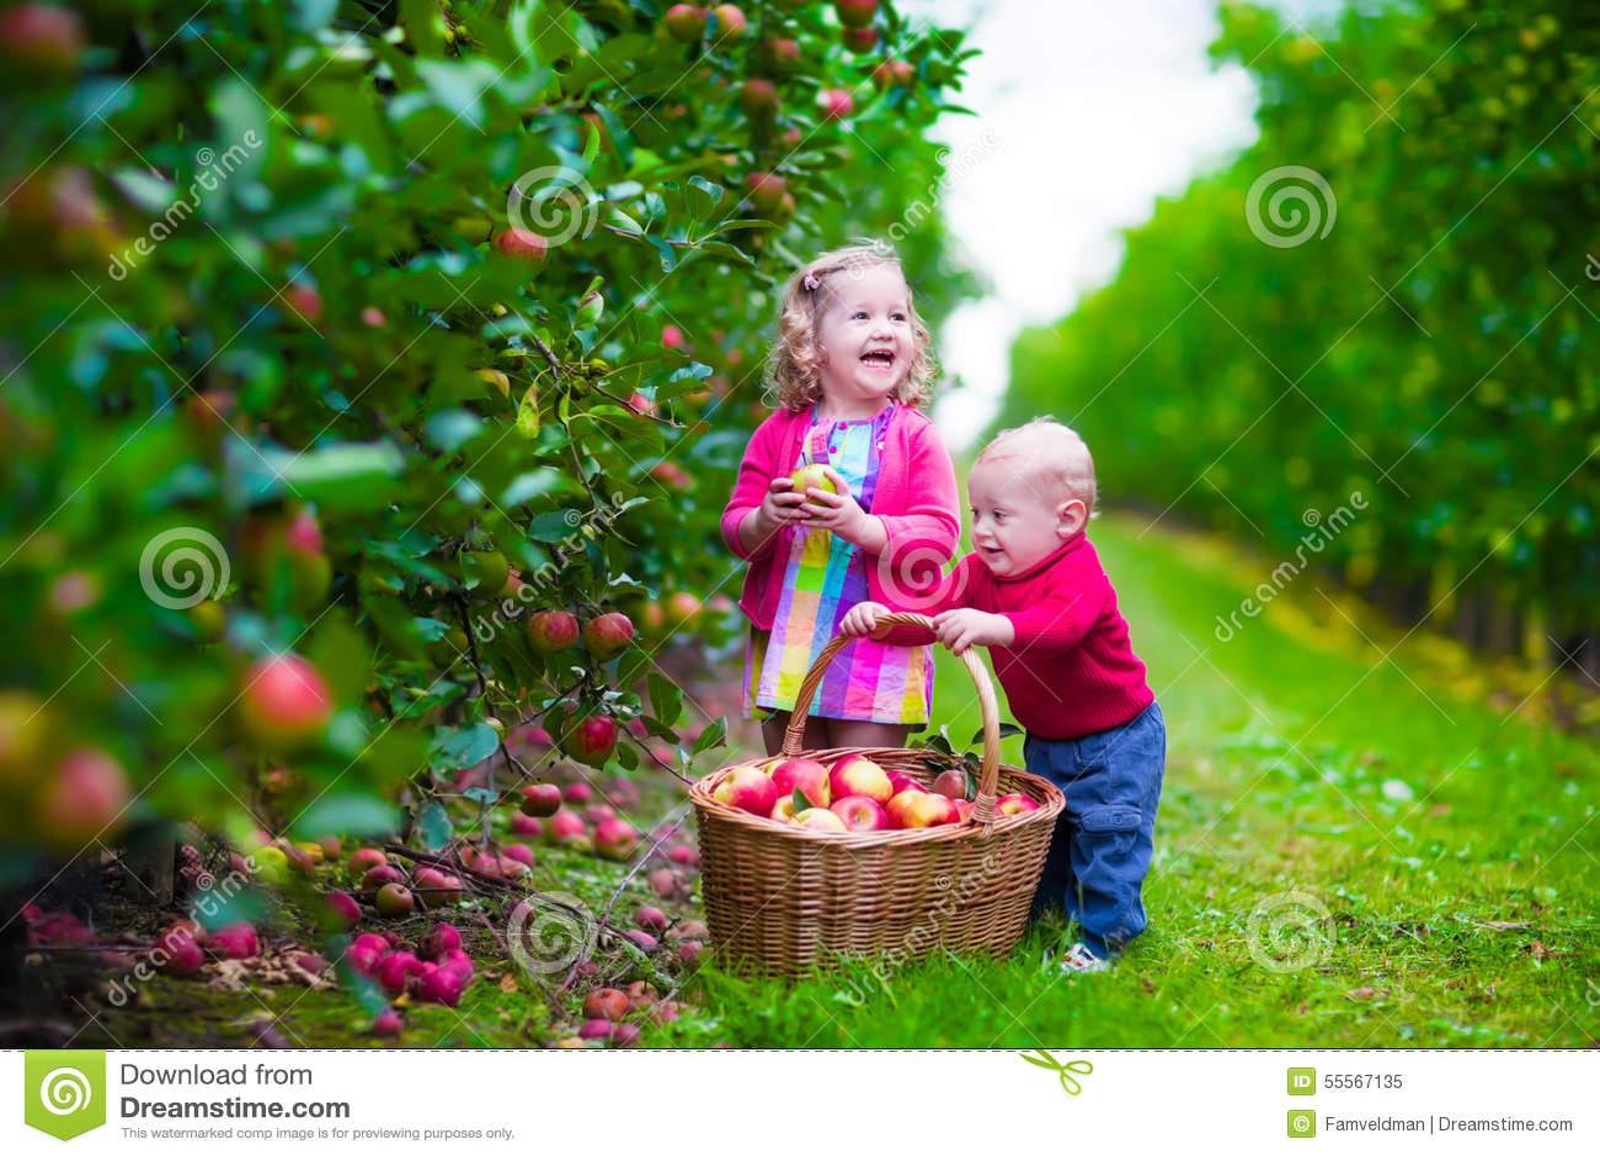 kids picking fresh apple on a farm - Kids Pic Download